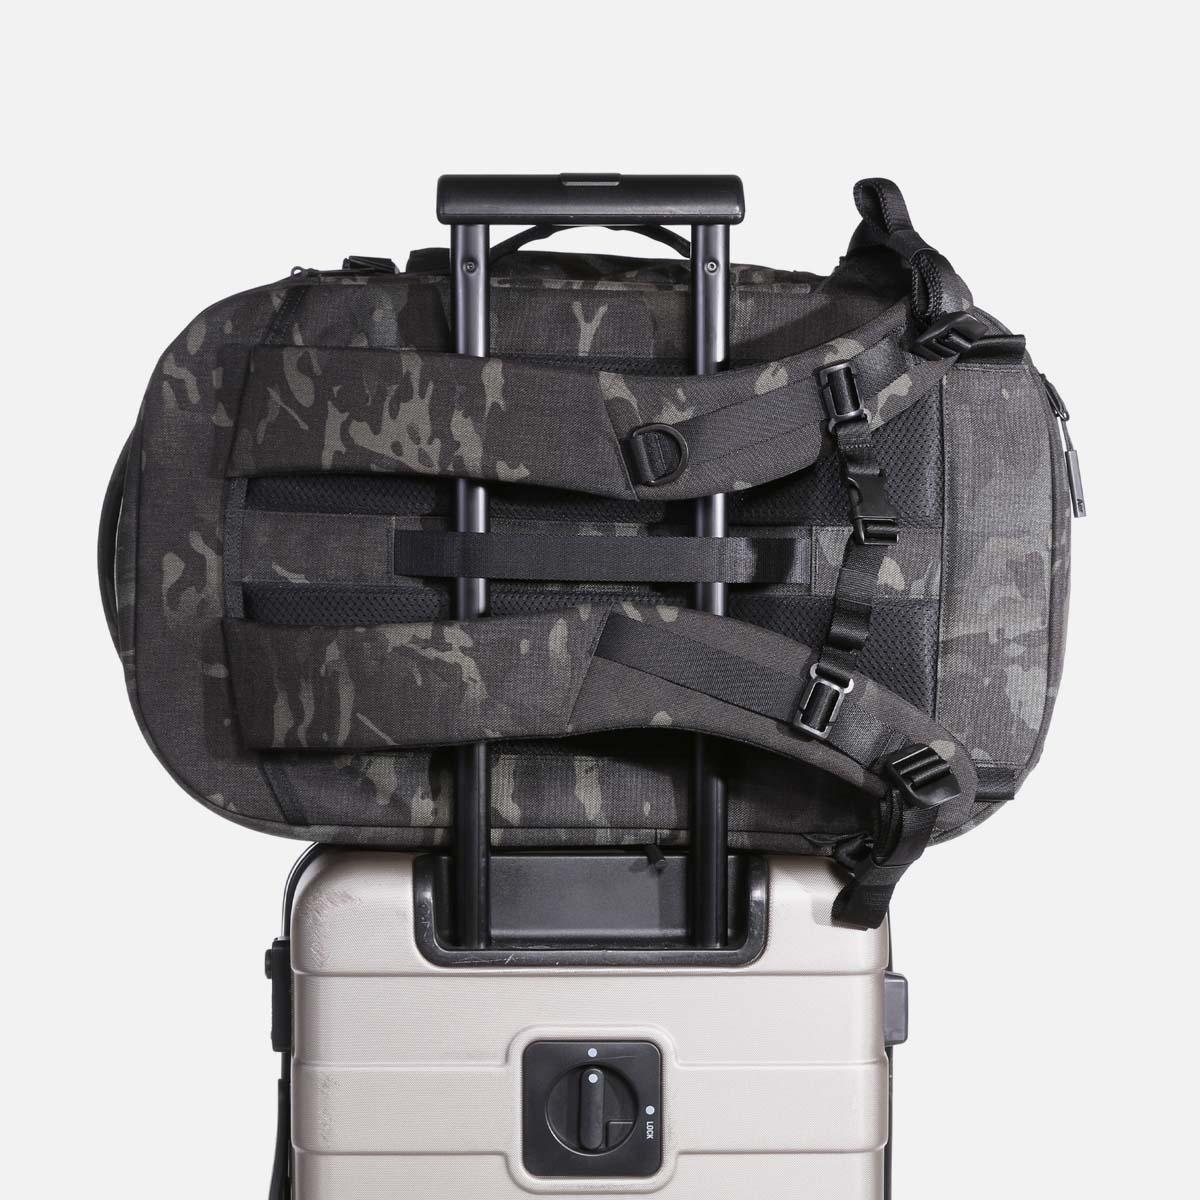 24007_tp2_blackcamo_luggage.jpg